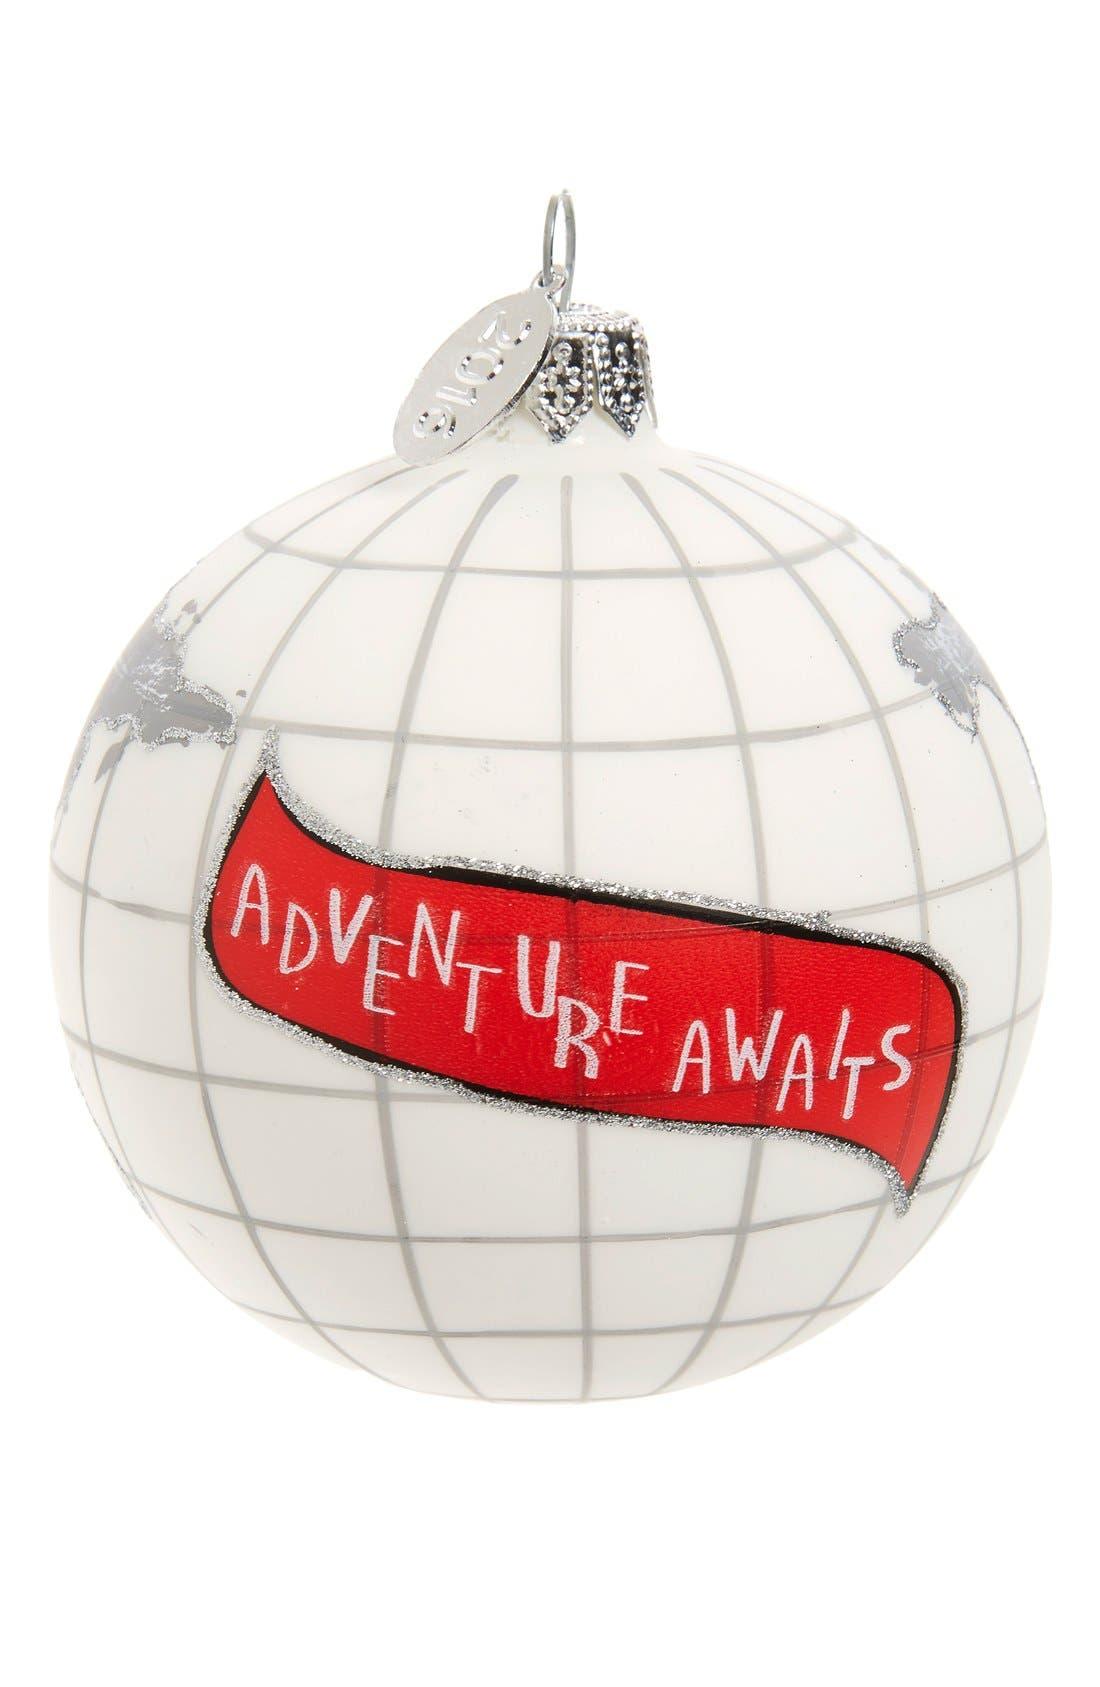 Nordstrom at Home 'Travel' Handblown Glass Ball Ornament